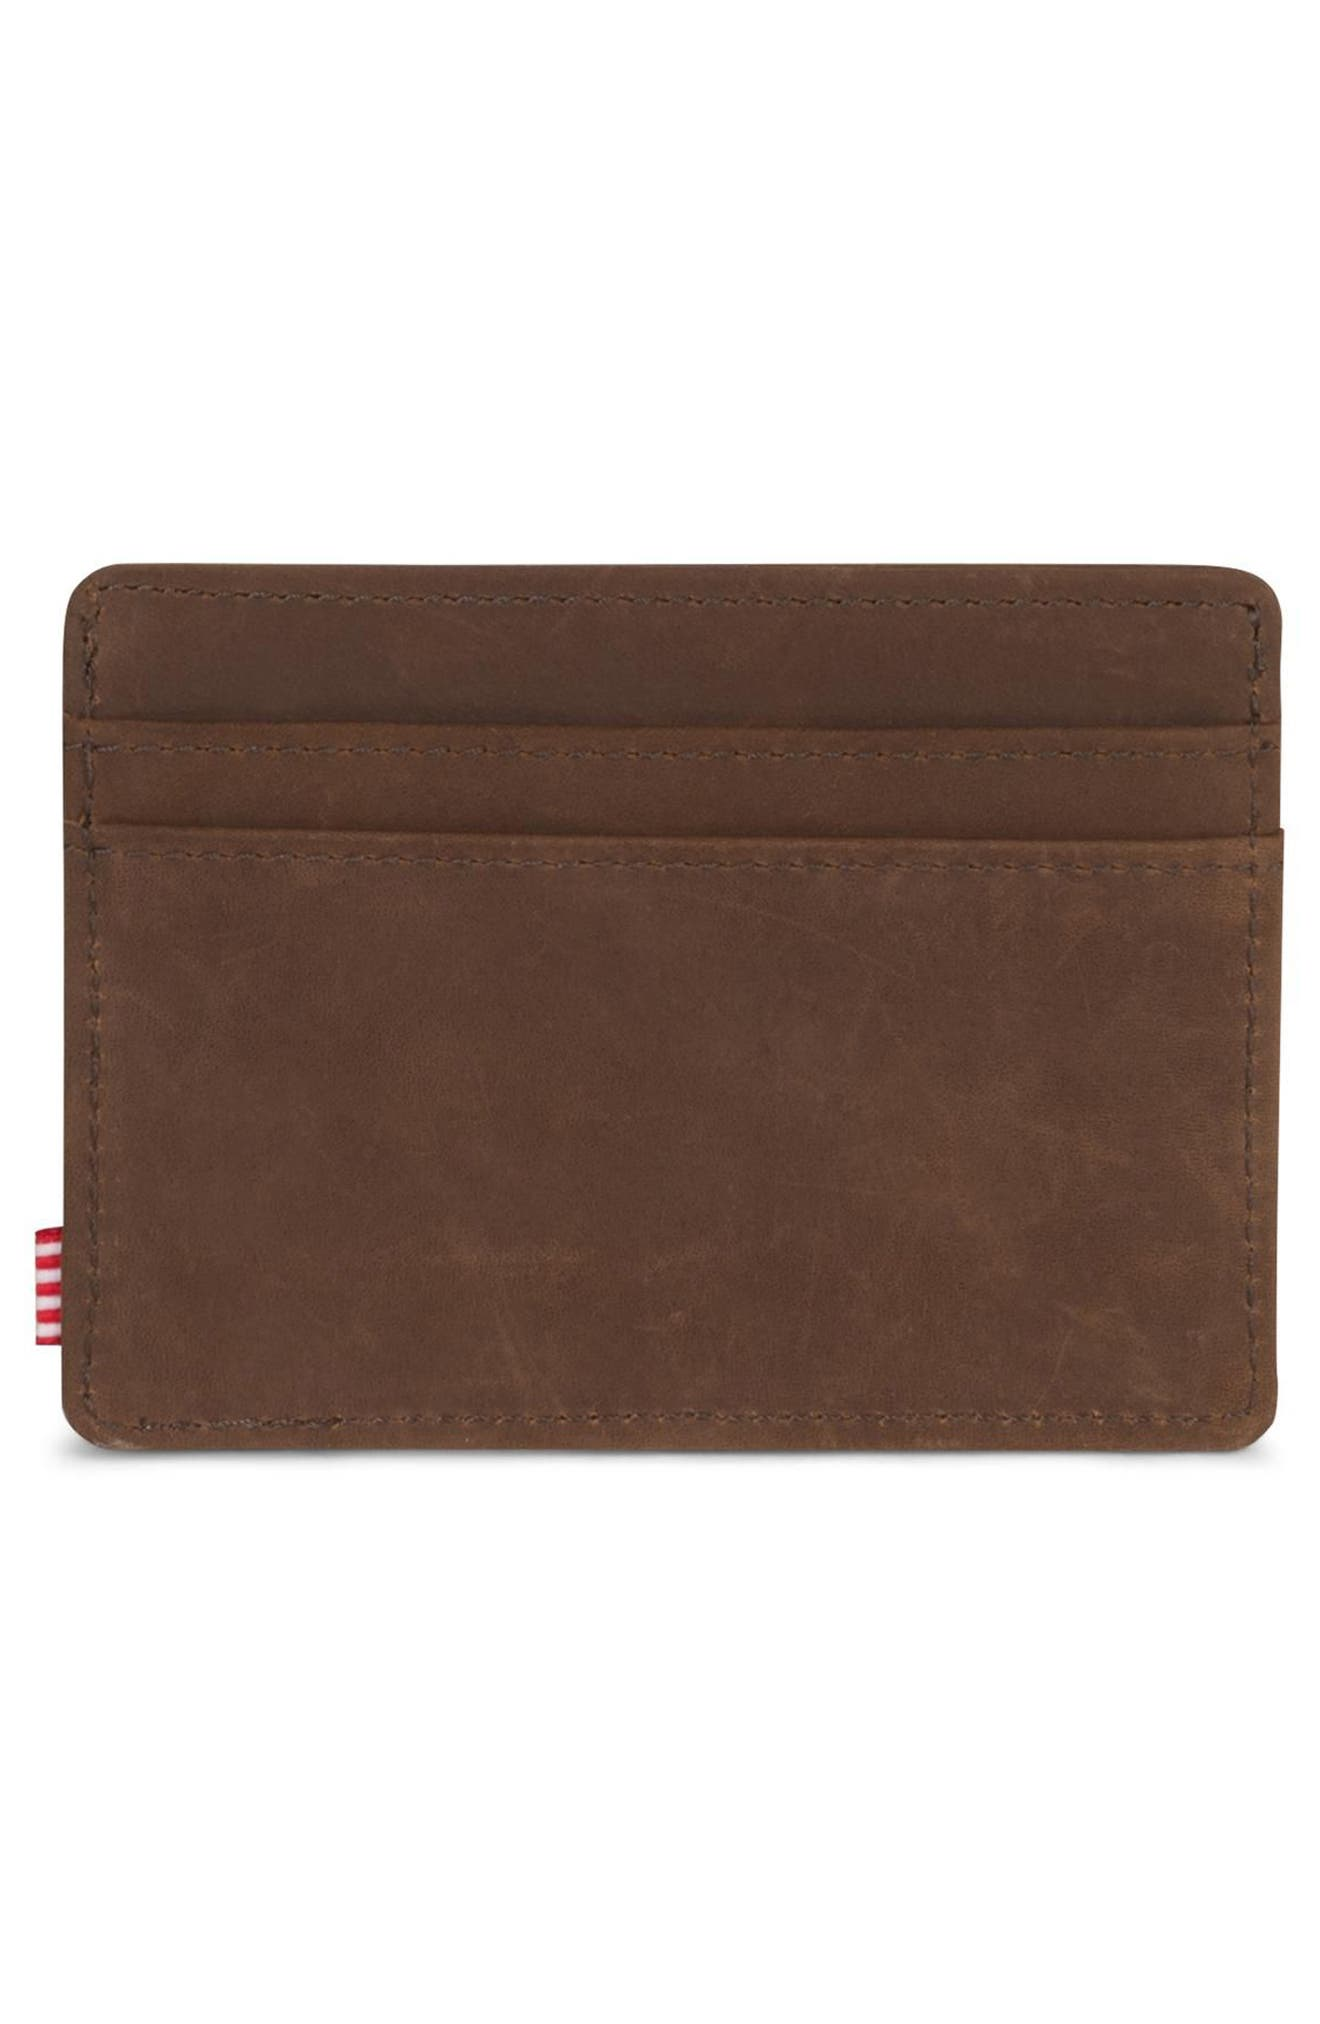 HERSCHEL SUPPLY CO., Charlie Nubuck Leather Card Case, Alternate thumbnail 2, color, NUBUCK BROWN